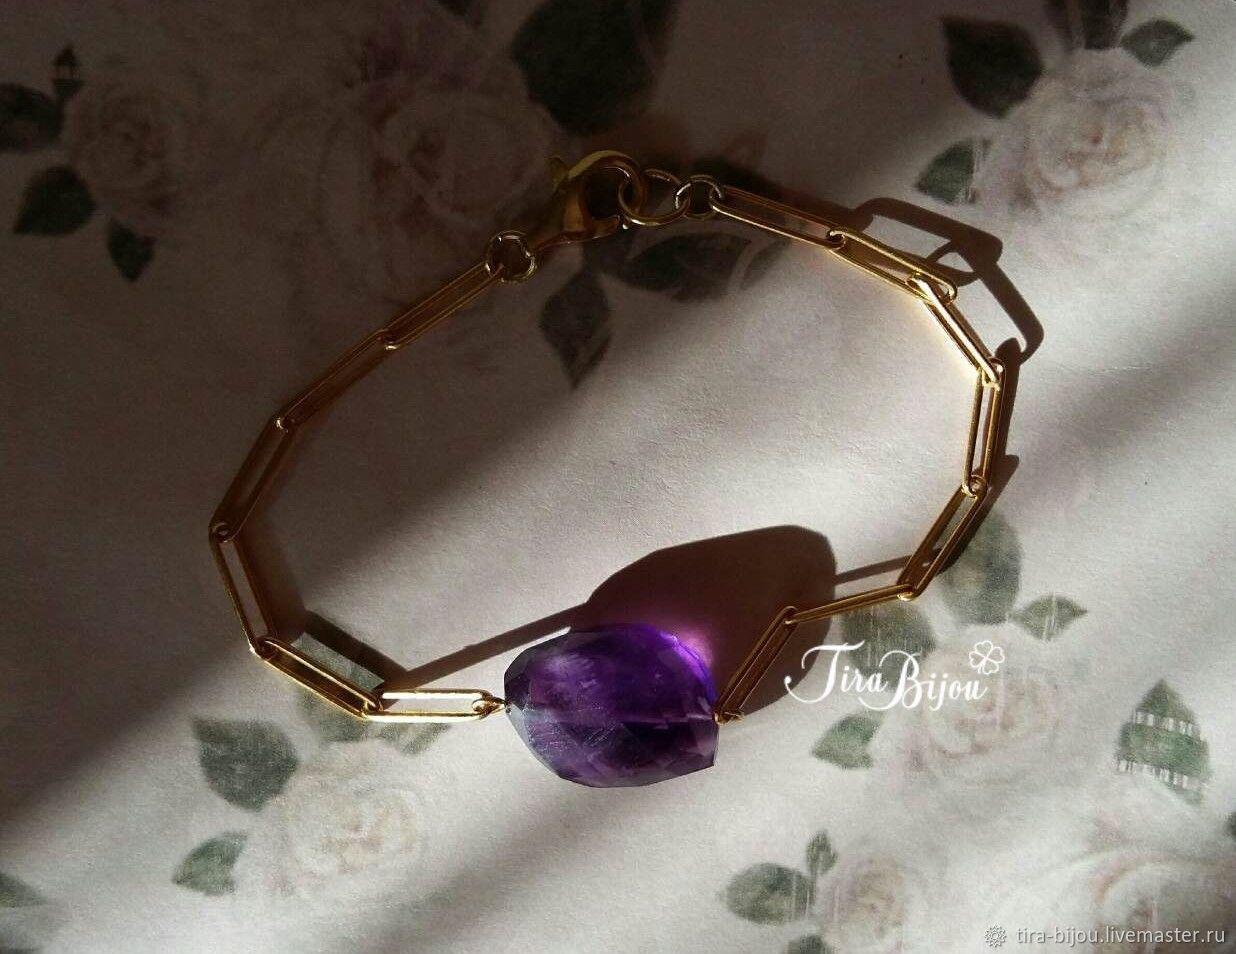 Bracelet with amethyst, 925 sterling silver, plating 14karat, Bead bracelet, Moscow,  Фото №1